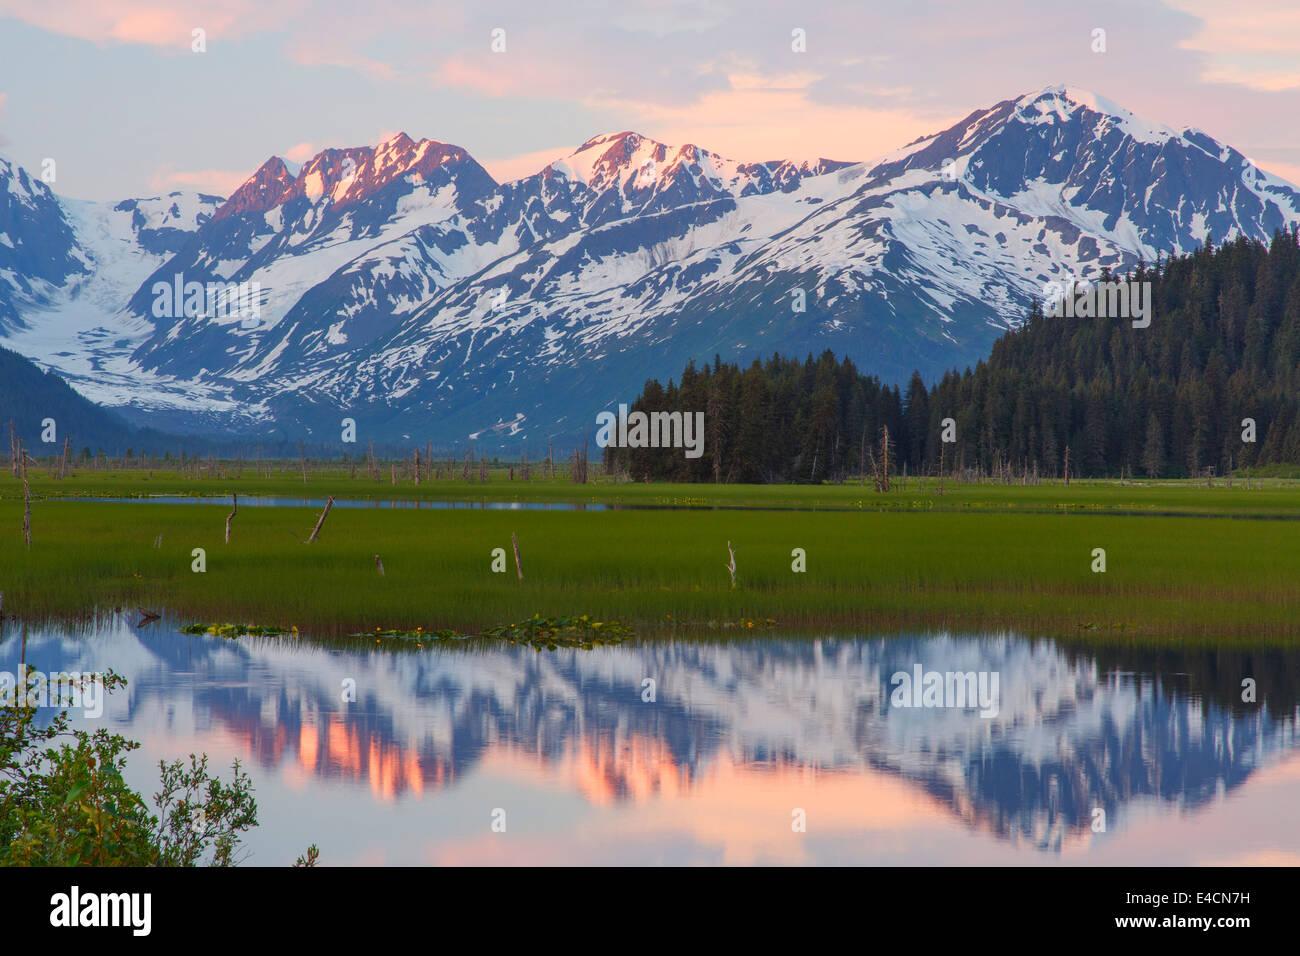 Ponds along the Seward Highway, Chugach National Forest, Alaska. - Stock Image